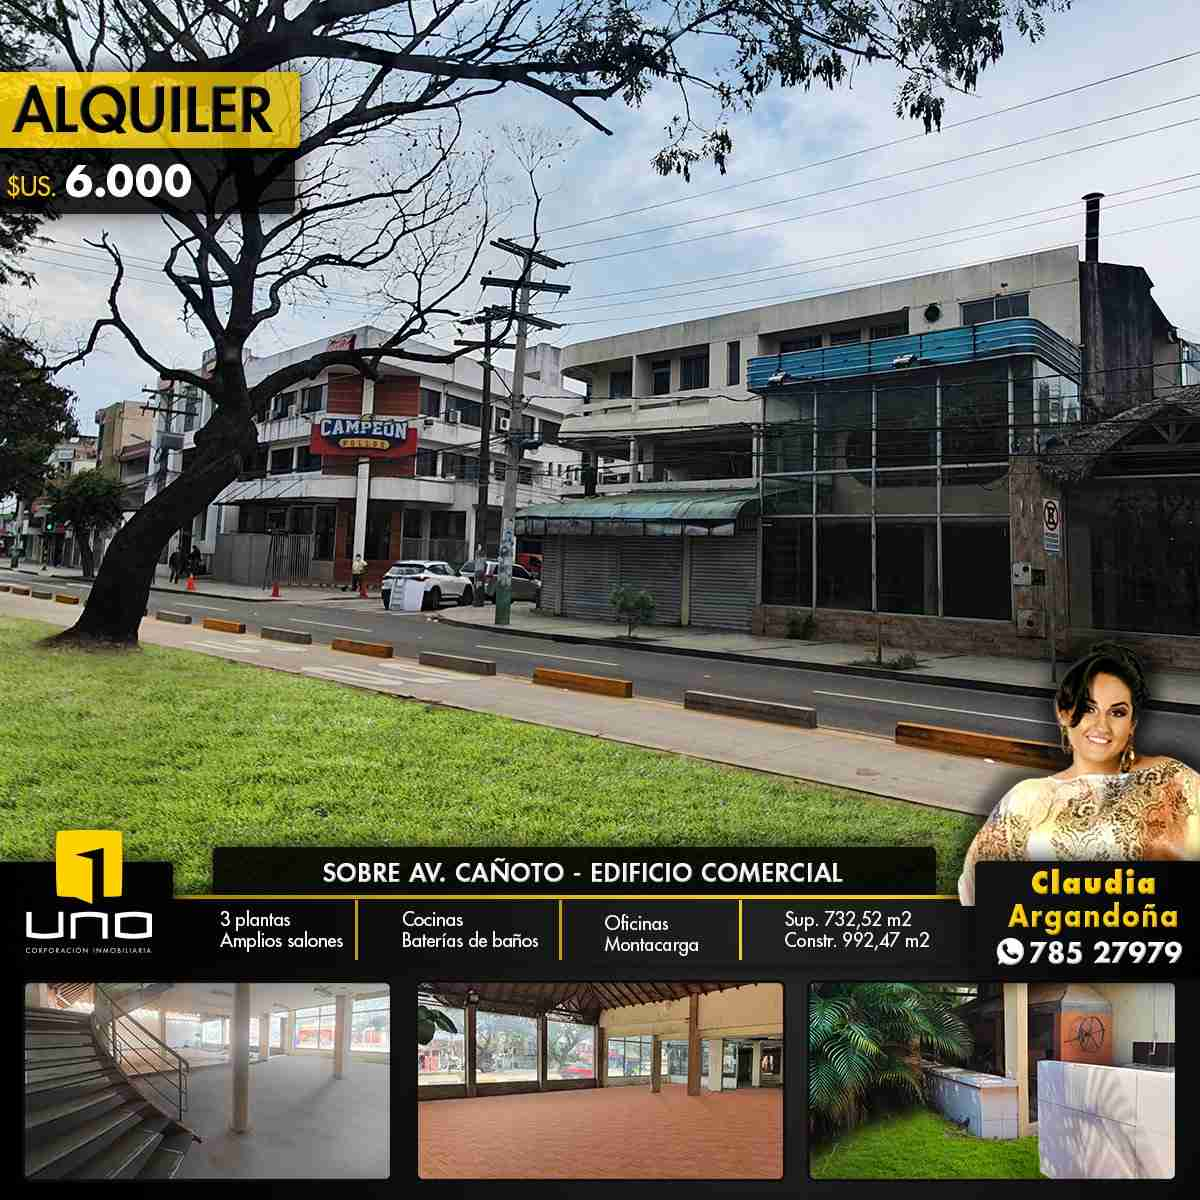 SOBRE AVENIDA CAÑOTO AMPLIO EDIFICIO COMERCIAL EN ALQUILER